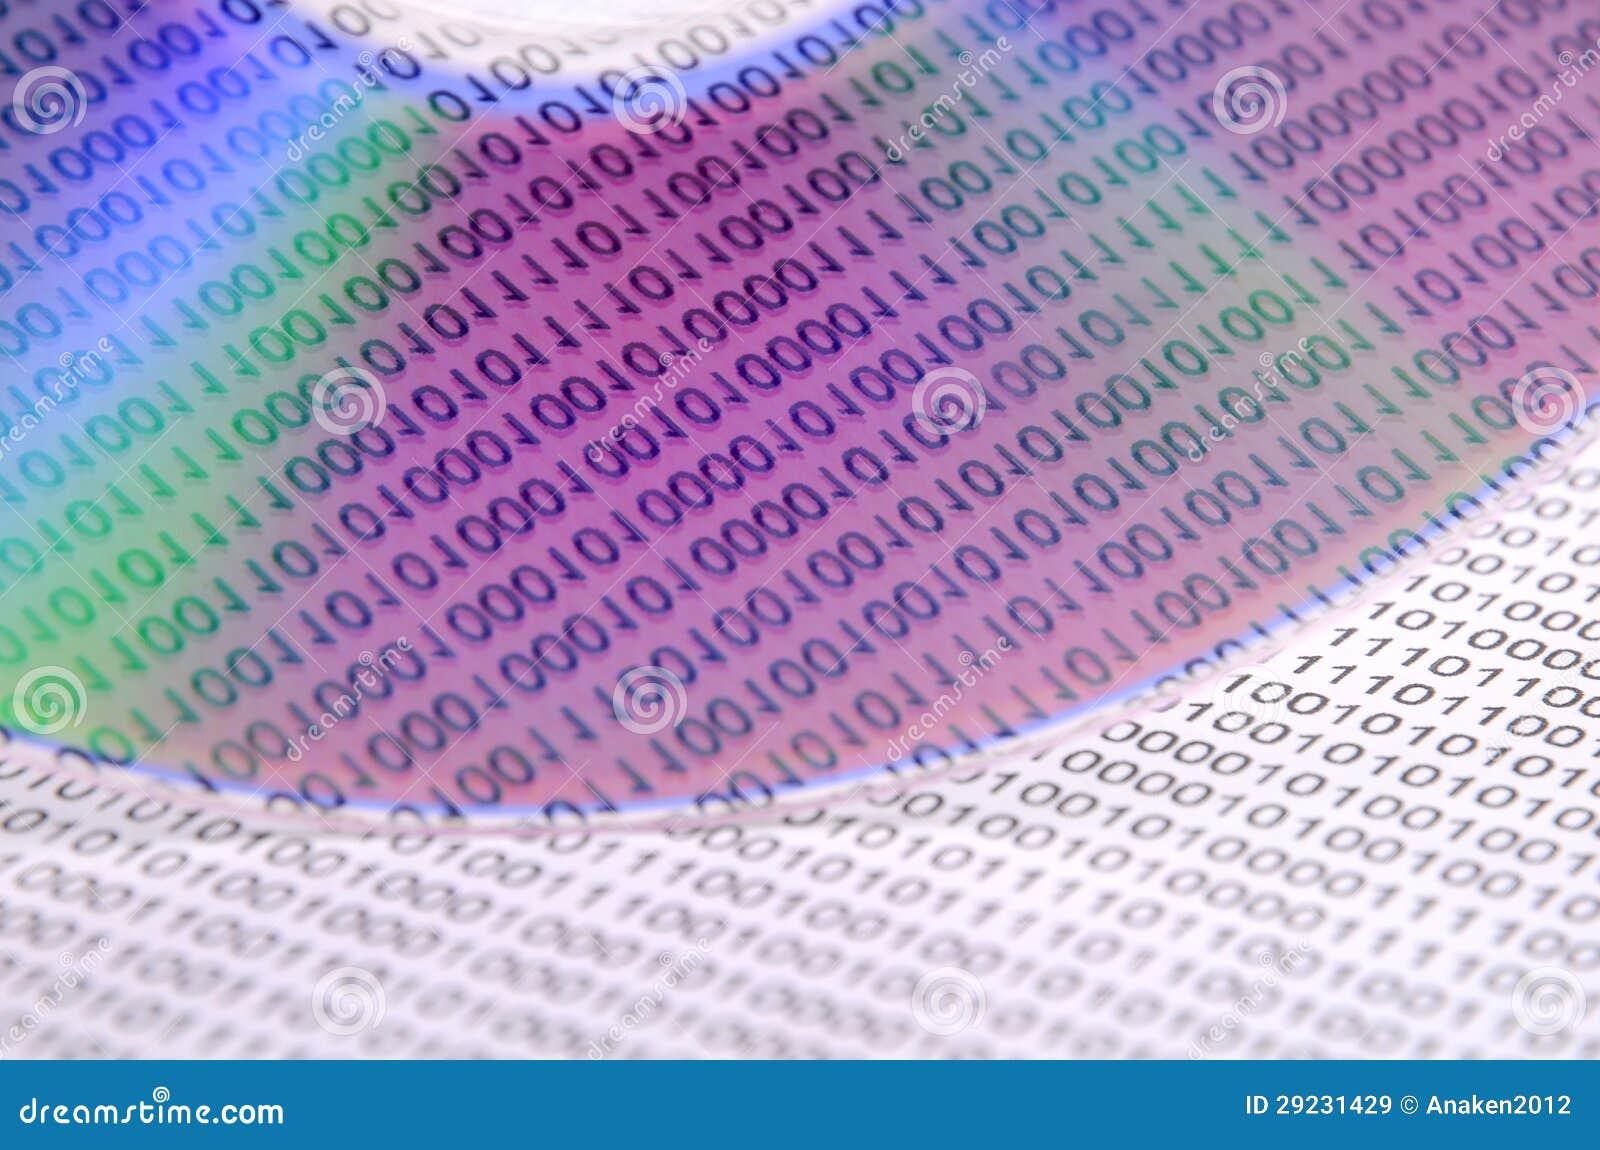 how to read binary watch